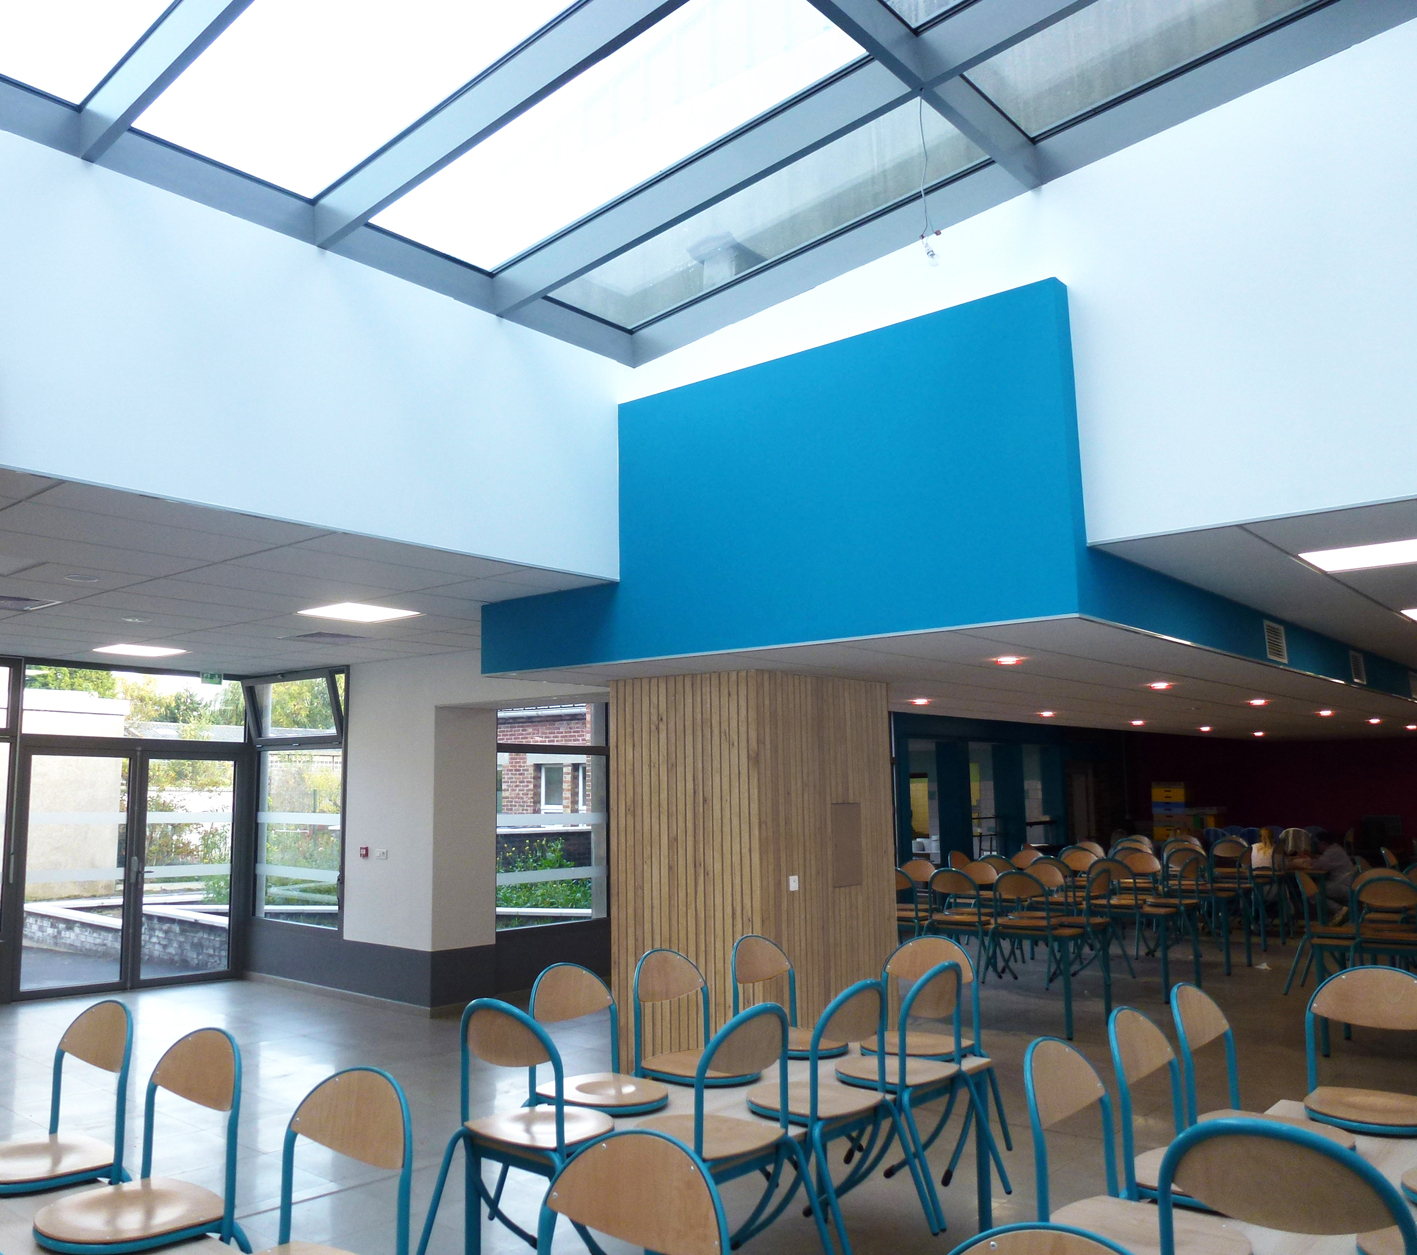 extension d 39 un restaurant scolaire marcq en bar ul 59 phase 2 agence delannoy simoens. Black Bedroom Furniture Sets. Home Design Ideas